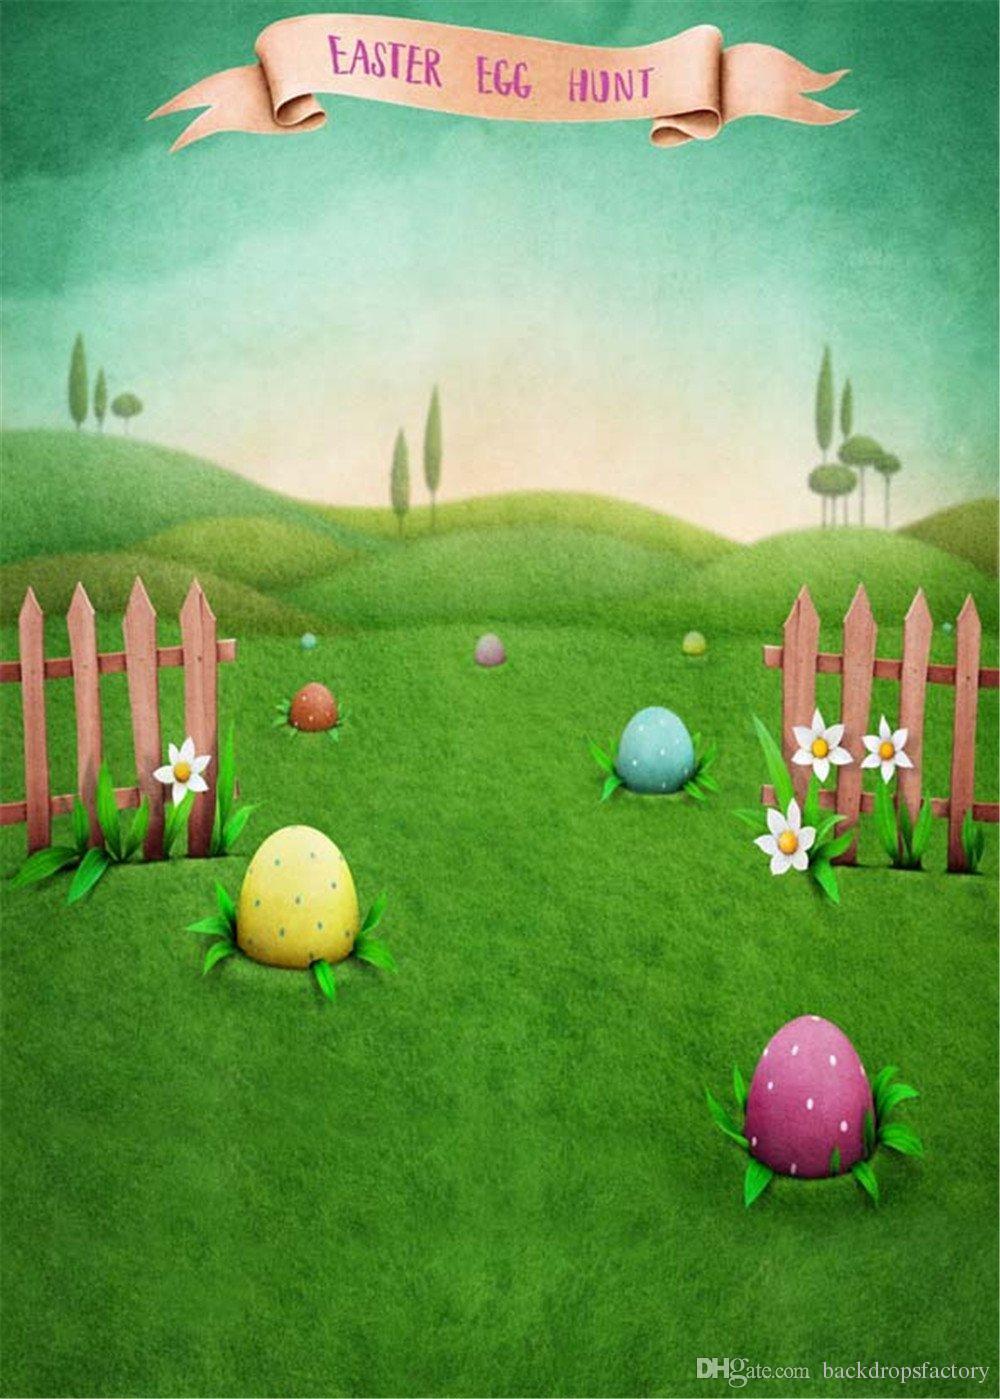 2019 Easter Egg Hunt Photography Backdrops Vinyl Printed ...